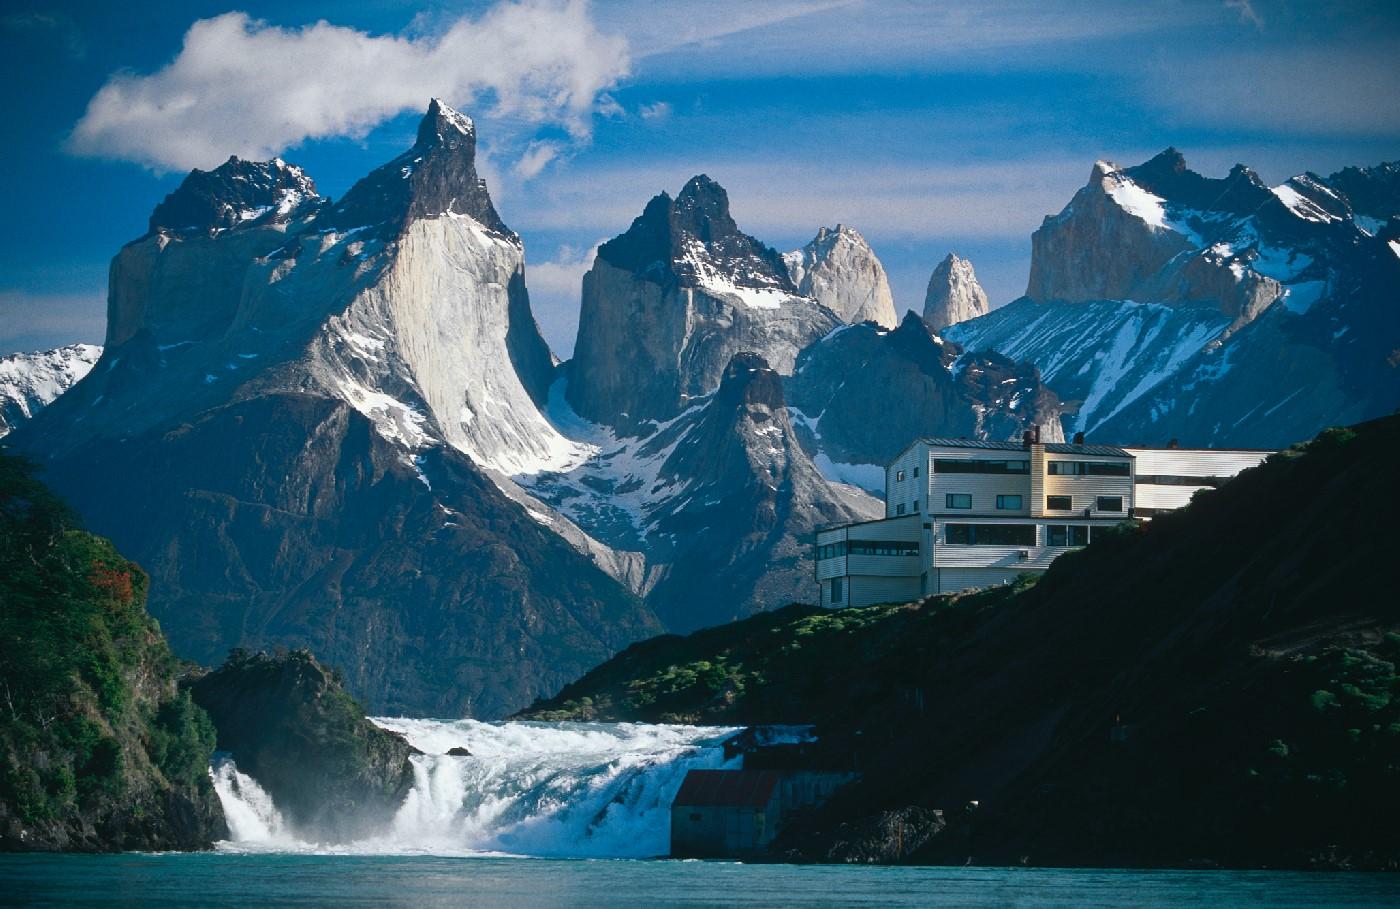 The mountains behind Explora Patagonia lodge